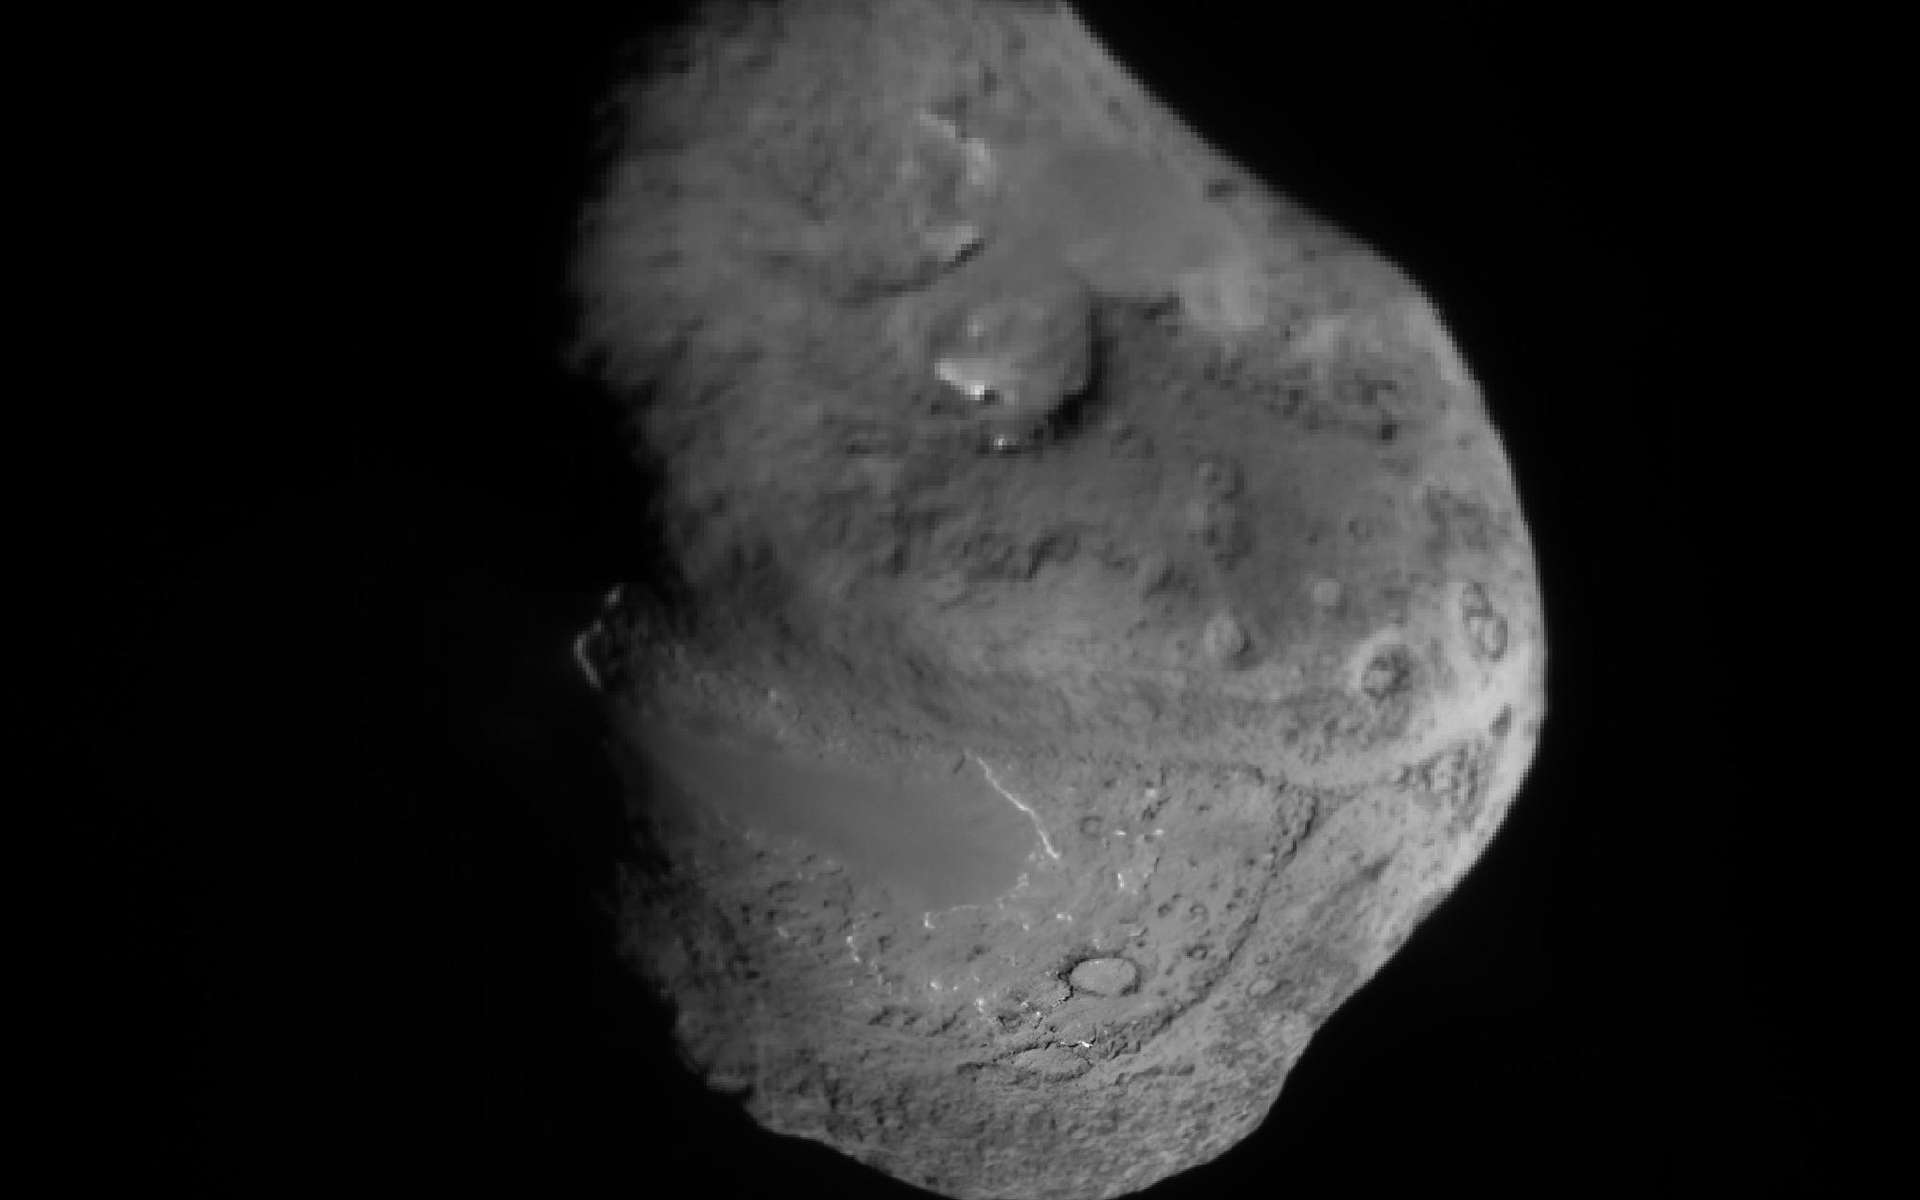 La comète Tempel 1 photographiée en 2005 par Deep Impact va recevoir sa deuxième visite. © Nasa/JPL/Caltech